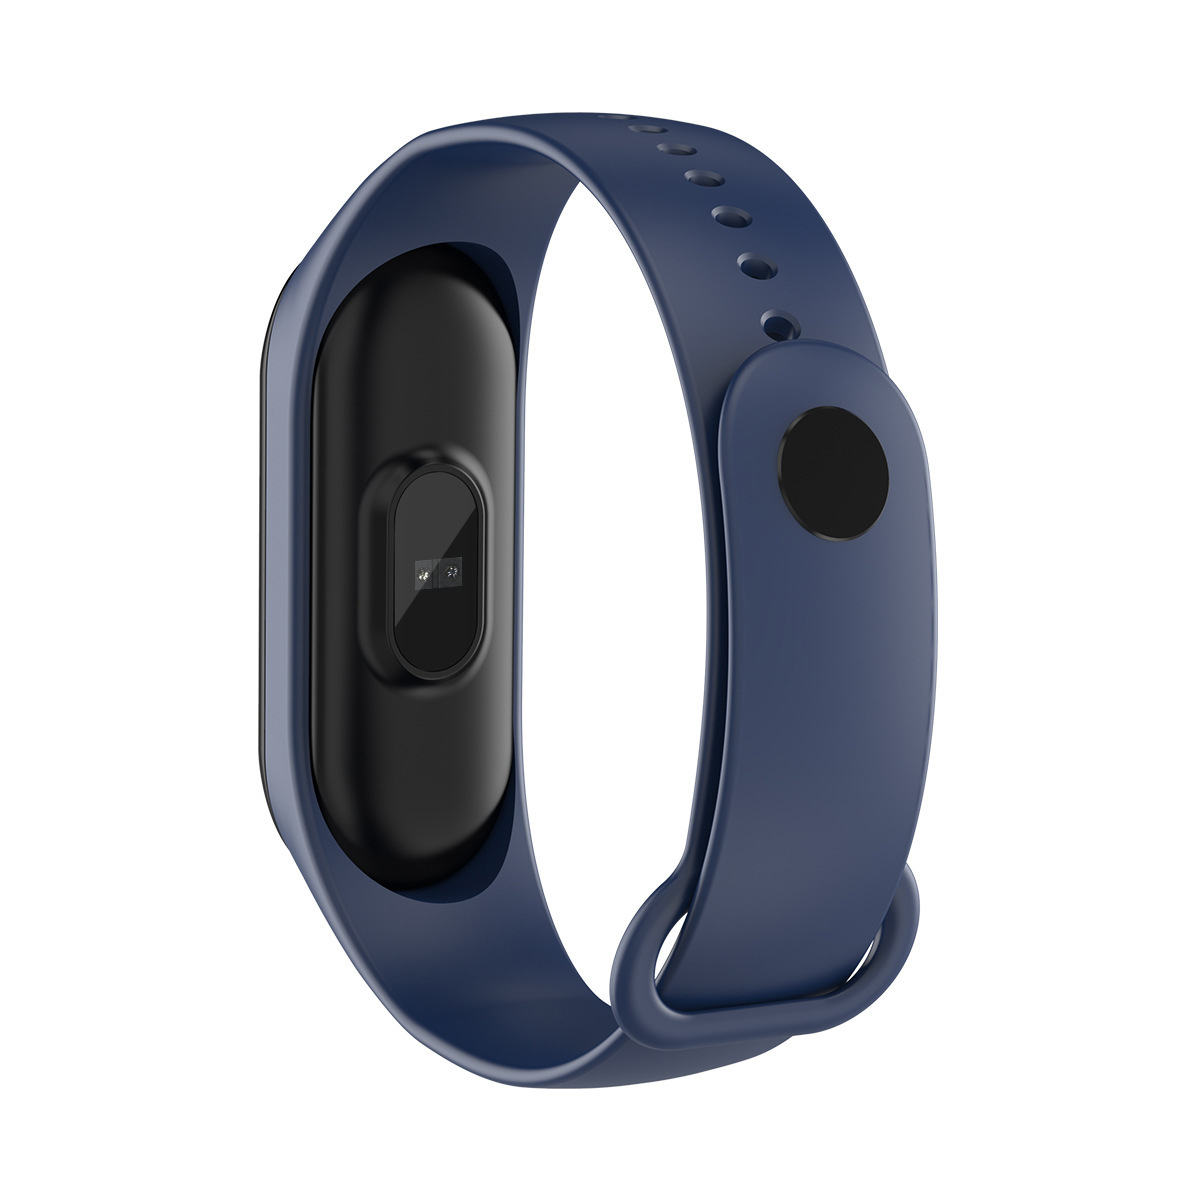 H917b5c0b53aa414589a96e0a2e6bc852d New M4 Smart Band Fitness Tracker Smart Watch Sport Smart Bracelet Heart Rate Blood Pressure Smartband Monitor Health Wristband